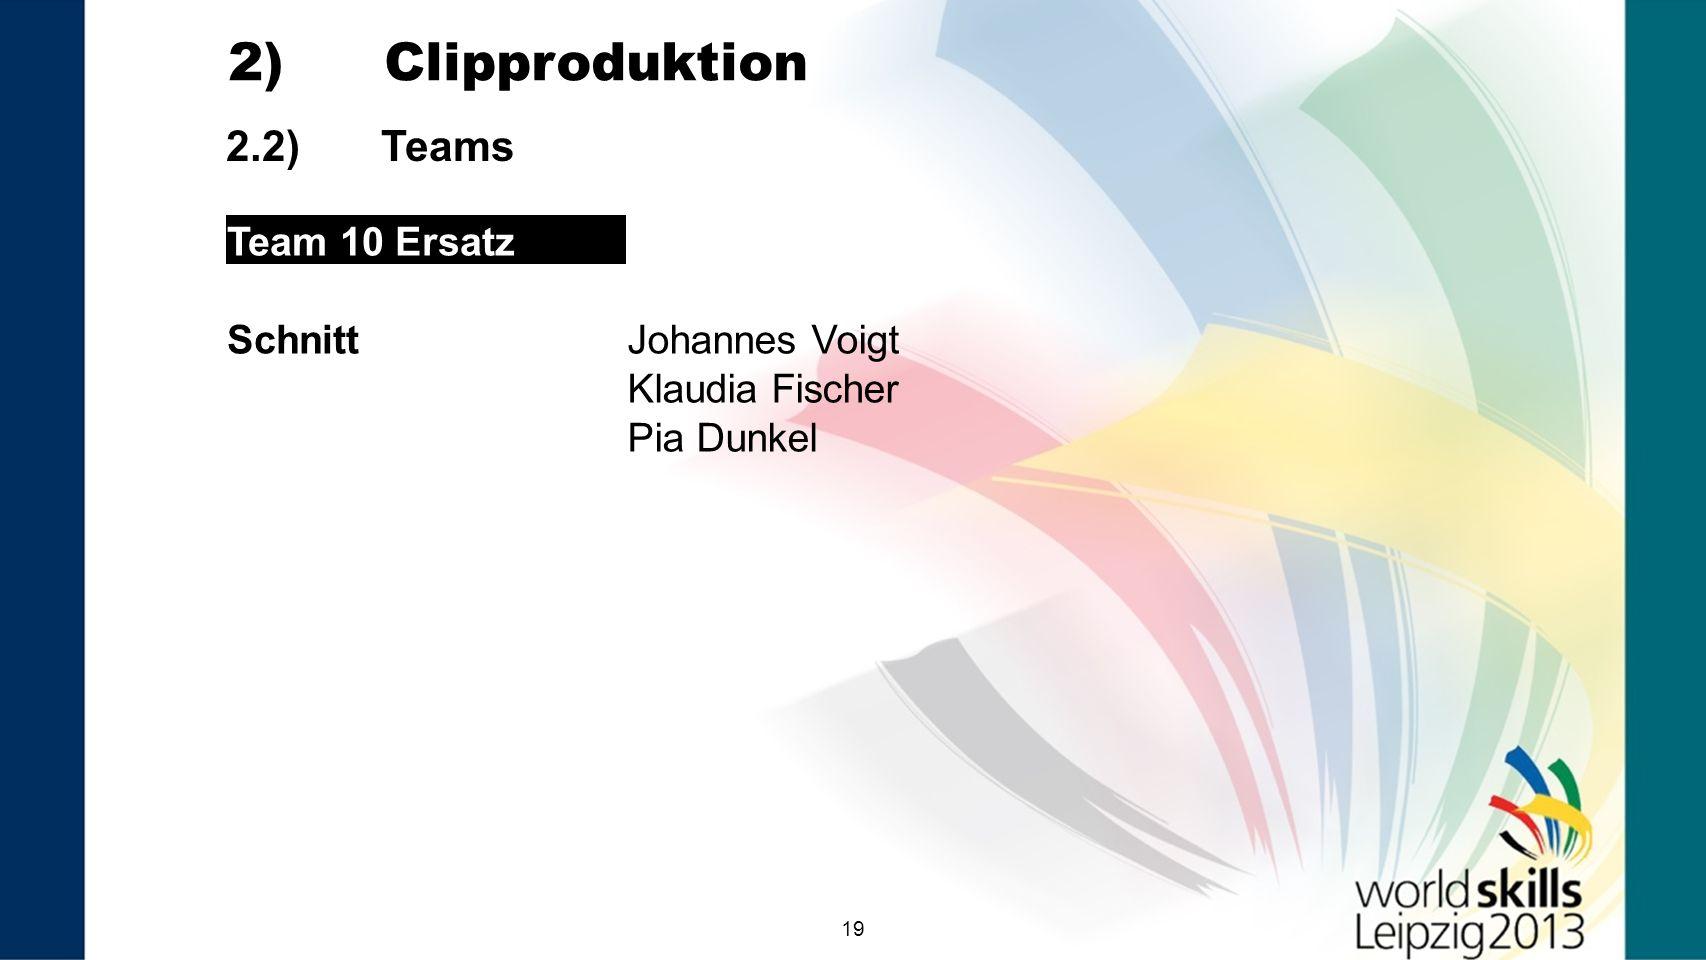 2) Clipproduktion 2.2) Teams Team 10 Ersatz Schnitt Johannes Voigt